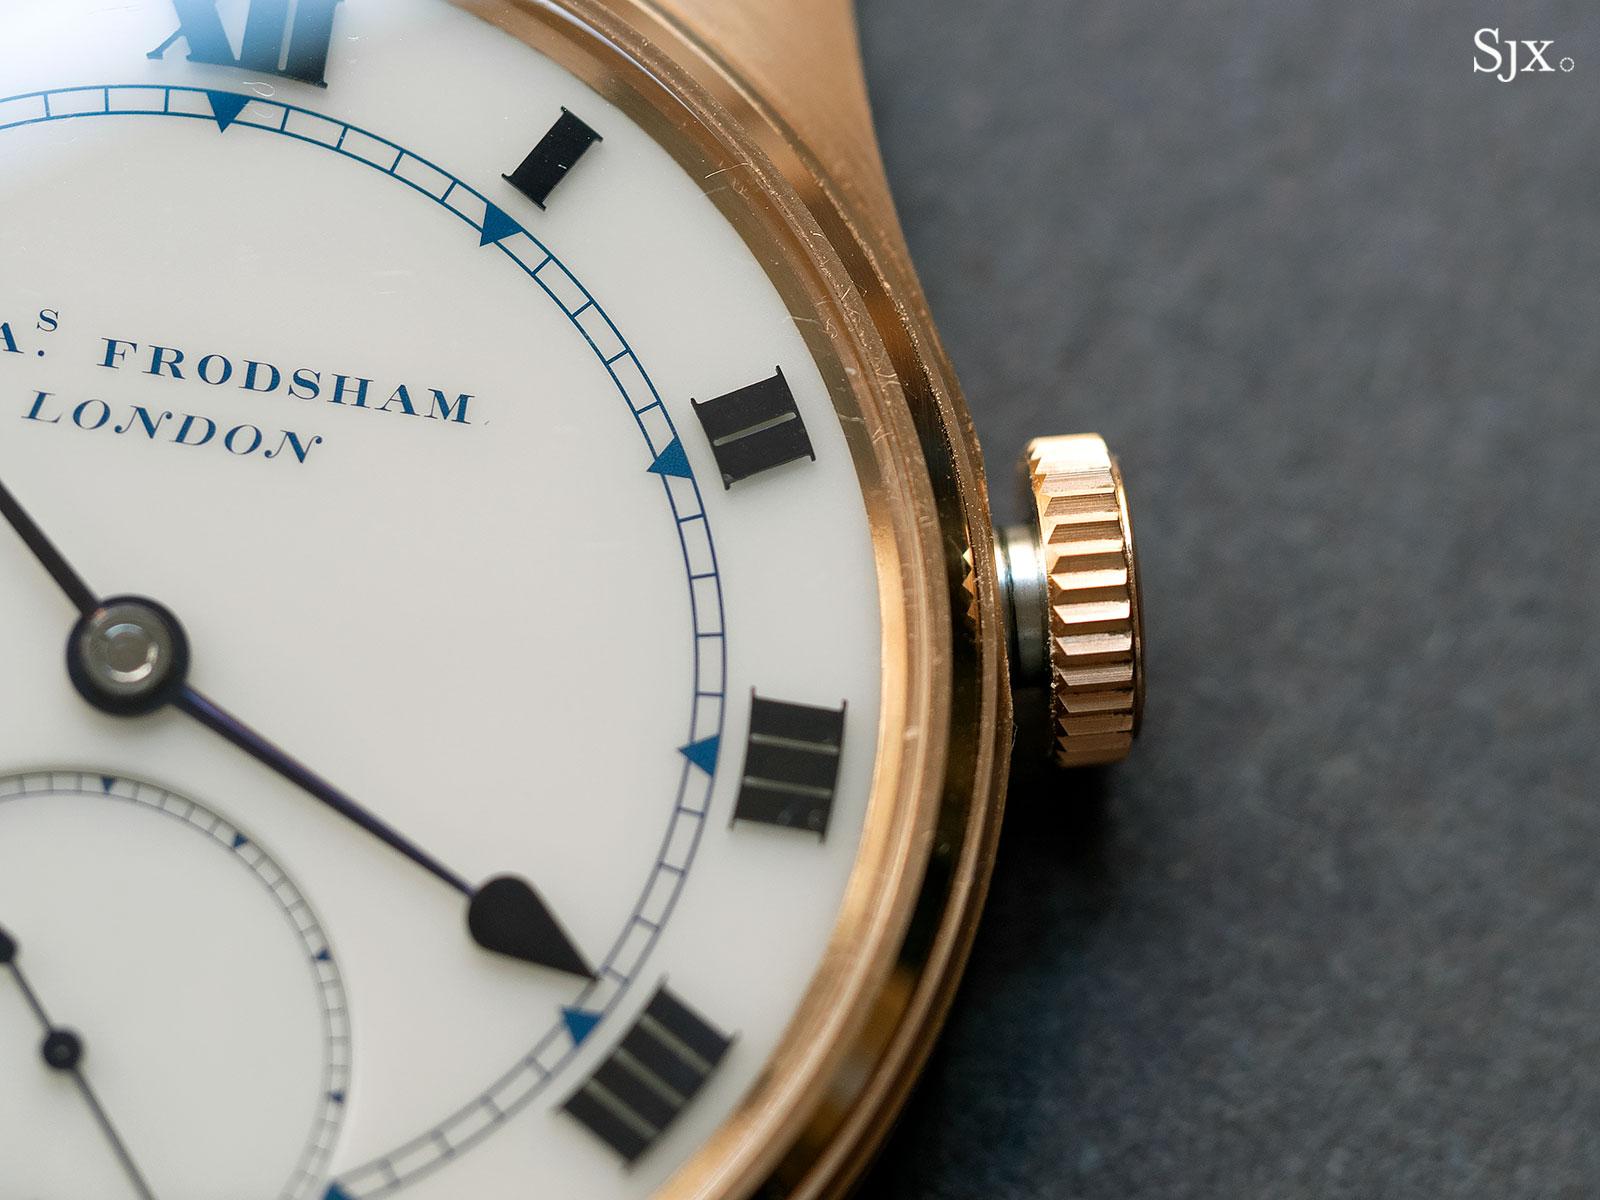 Frodsham Double Impulse chronometer rose gold 6